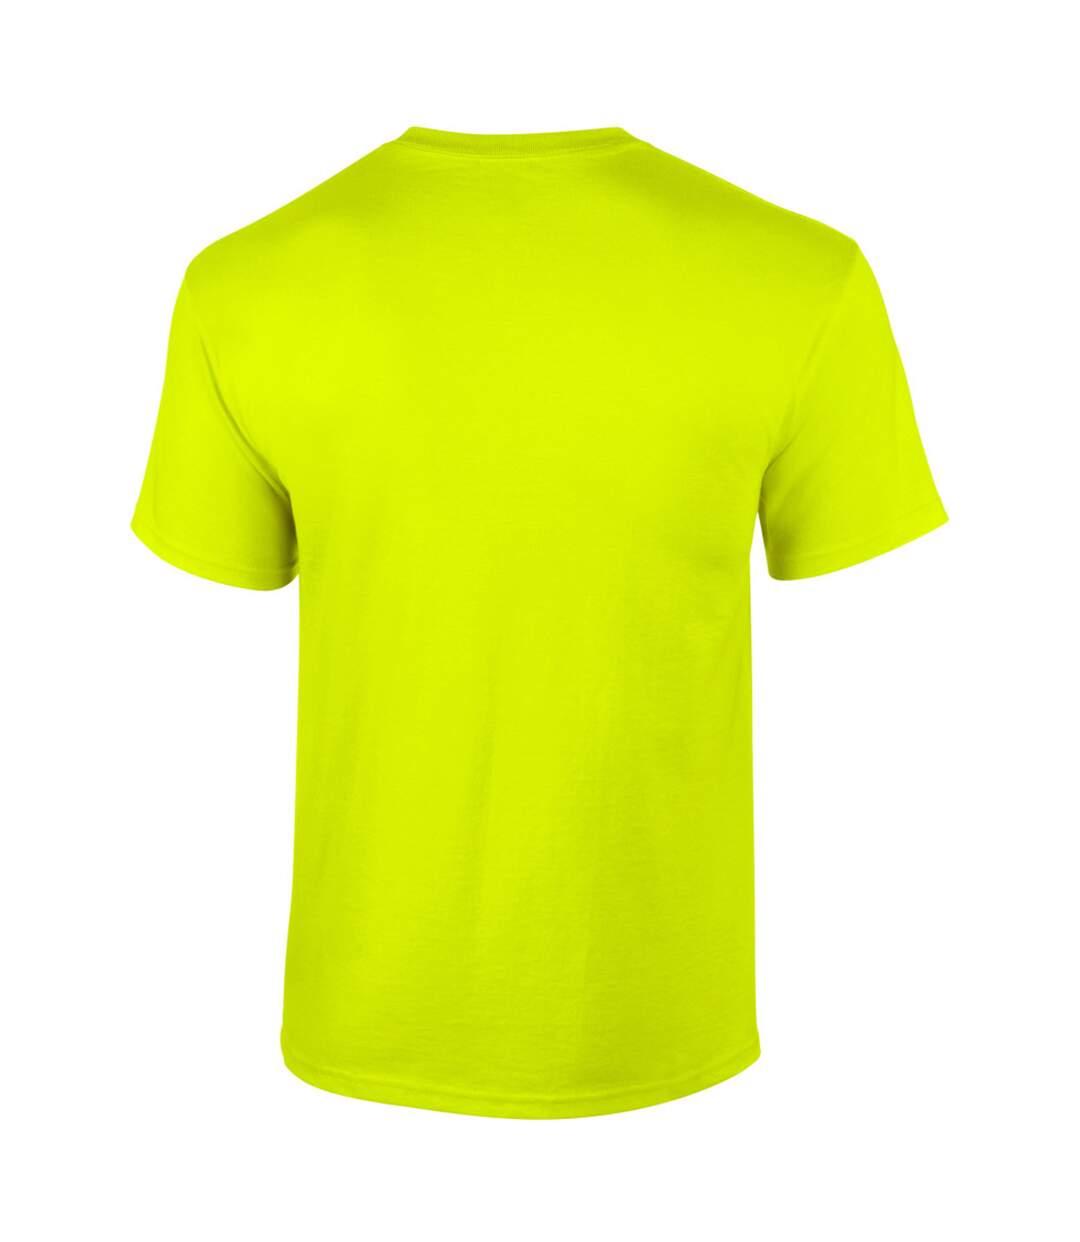 Gildan Mens Ultra Cotton Short Sleeve T-Shirt (Orange) - UTBC475